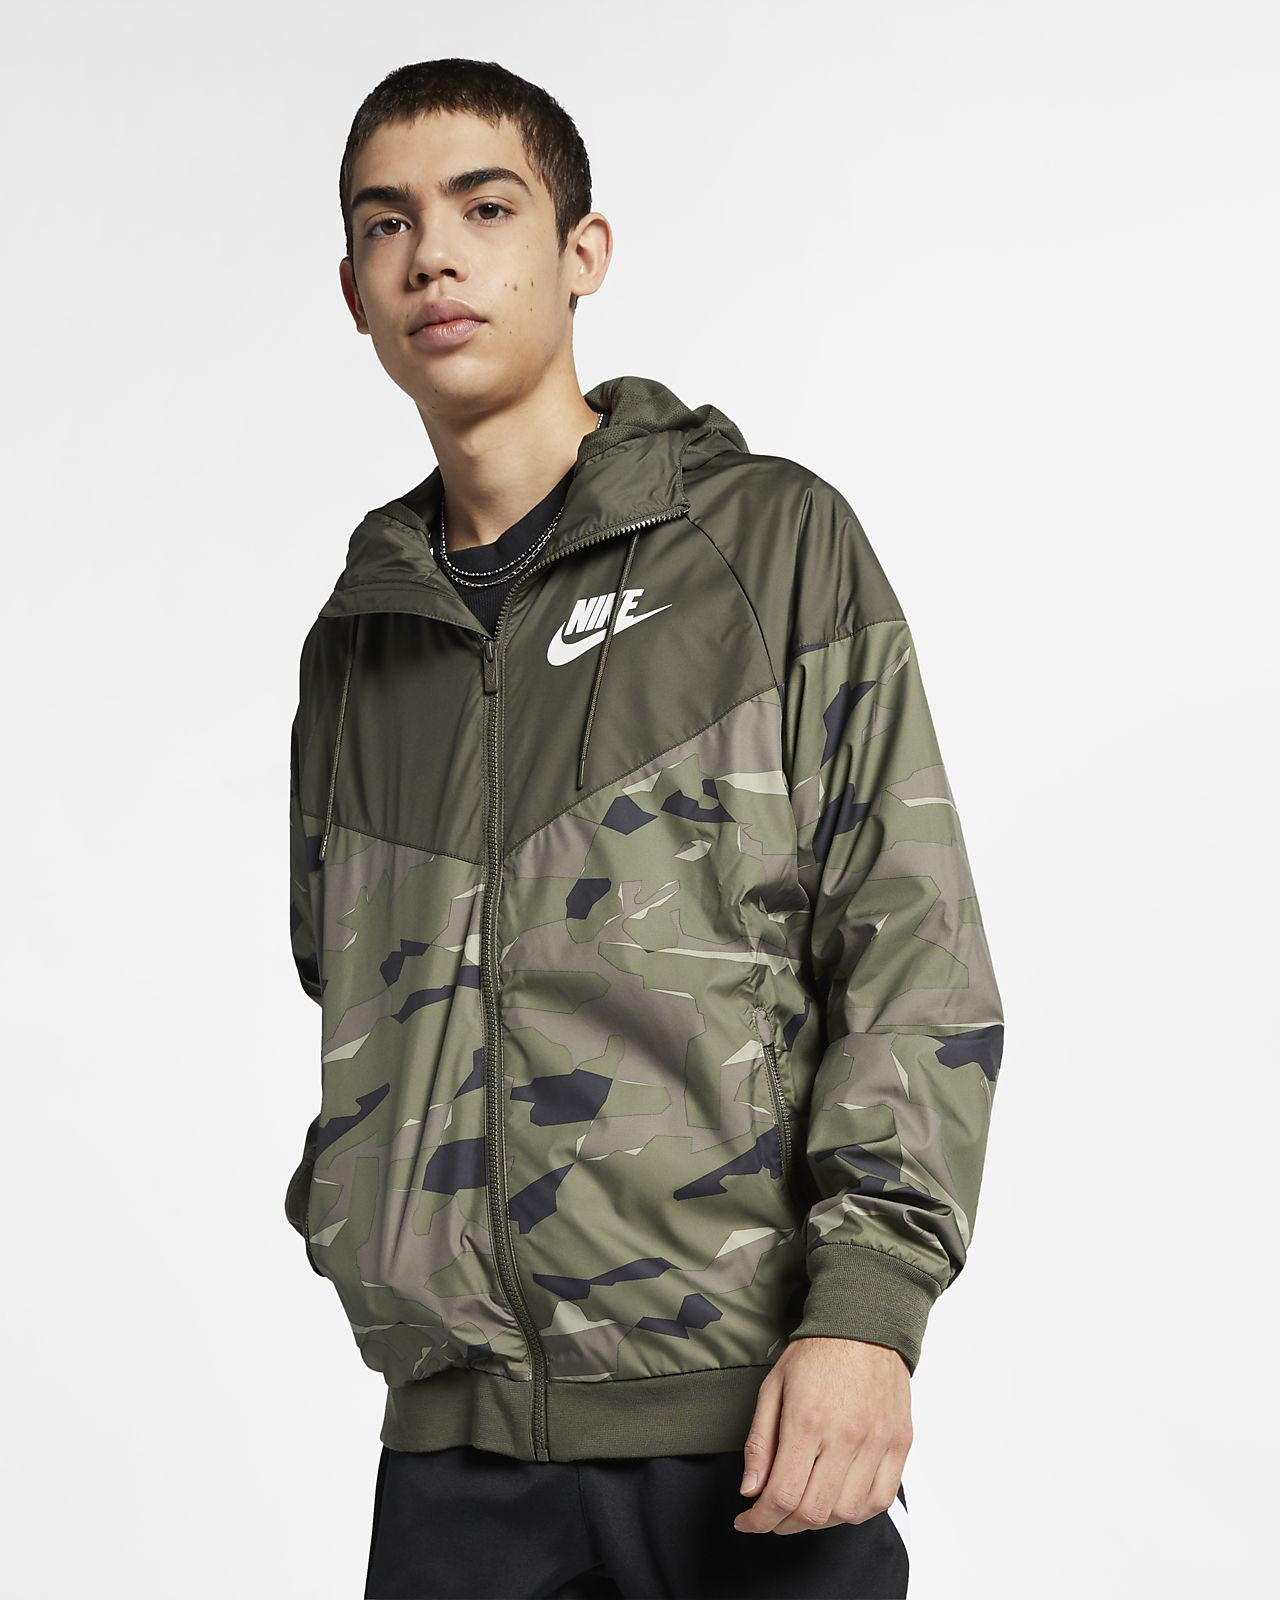 95f6dc20b0 Nike Sportswear Men s Windrunner Camo Jacket. Nike.com NZ